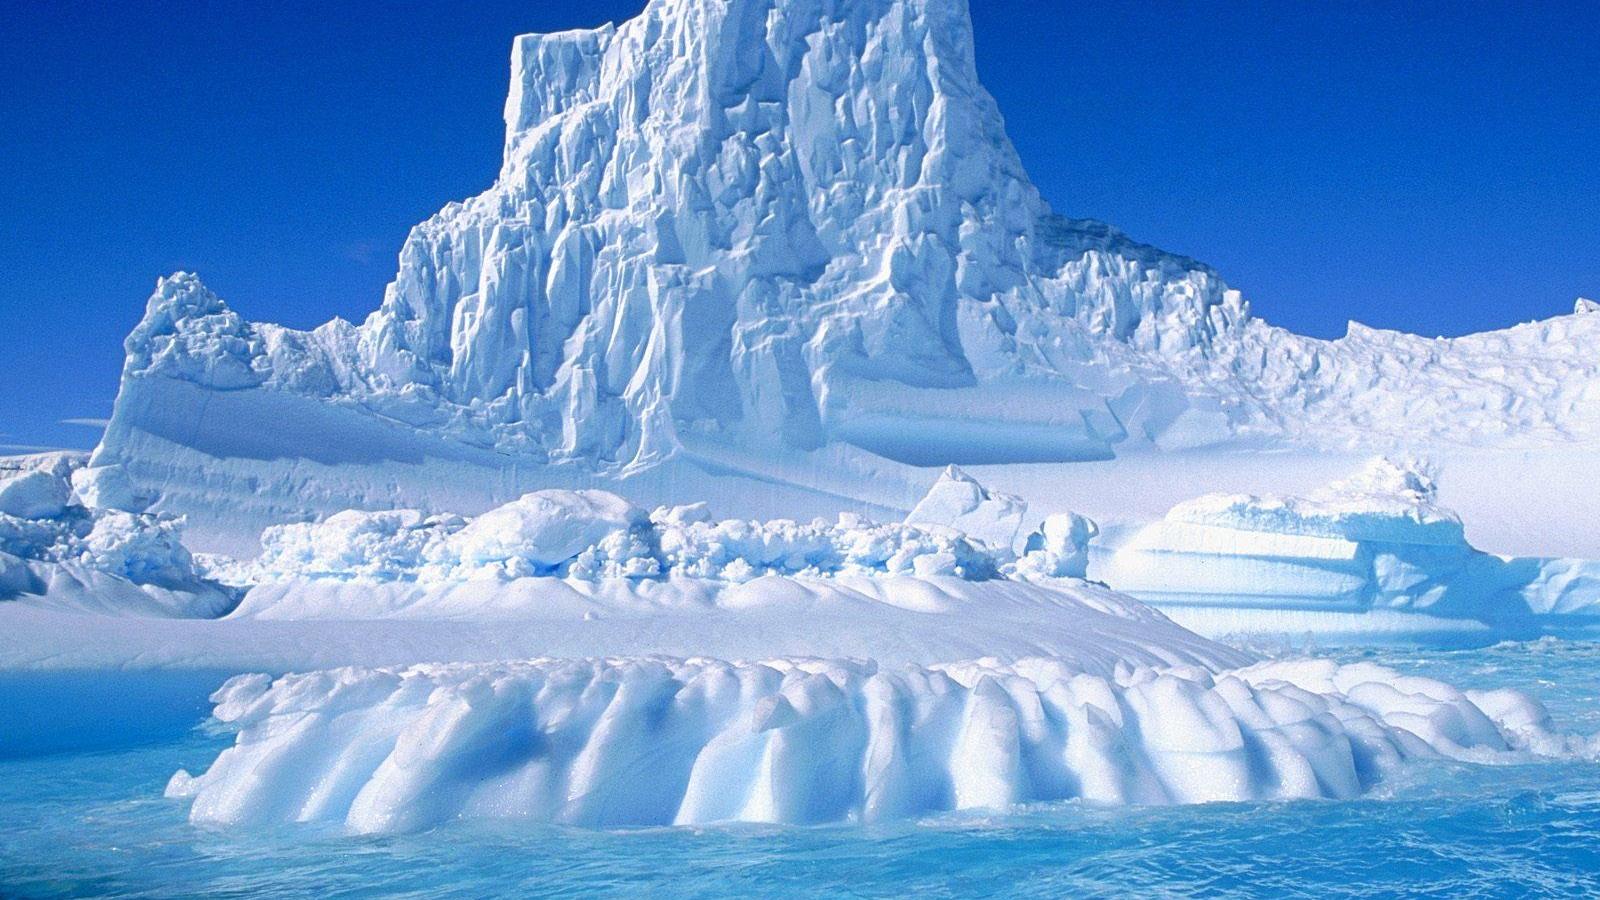 Cel mai mare ghetar din Antarctica orientala a intrat intr-o faza accelerata de topire